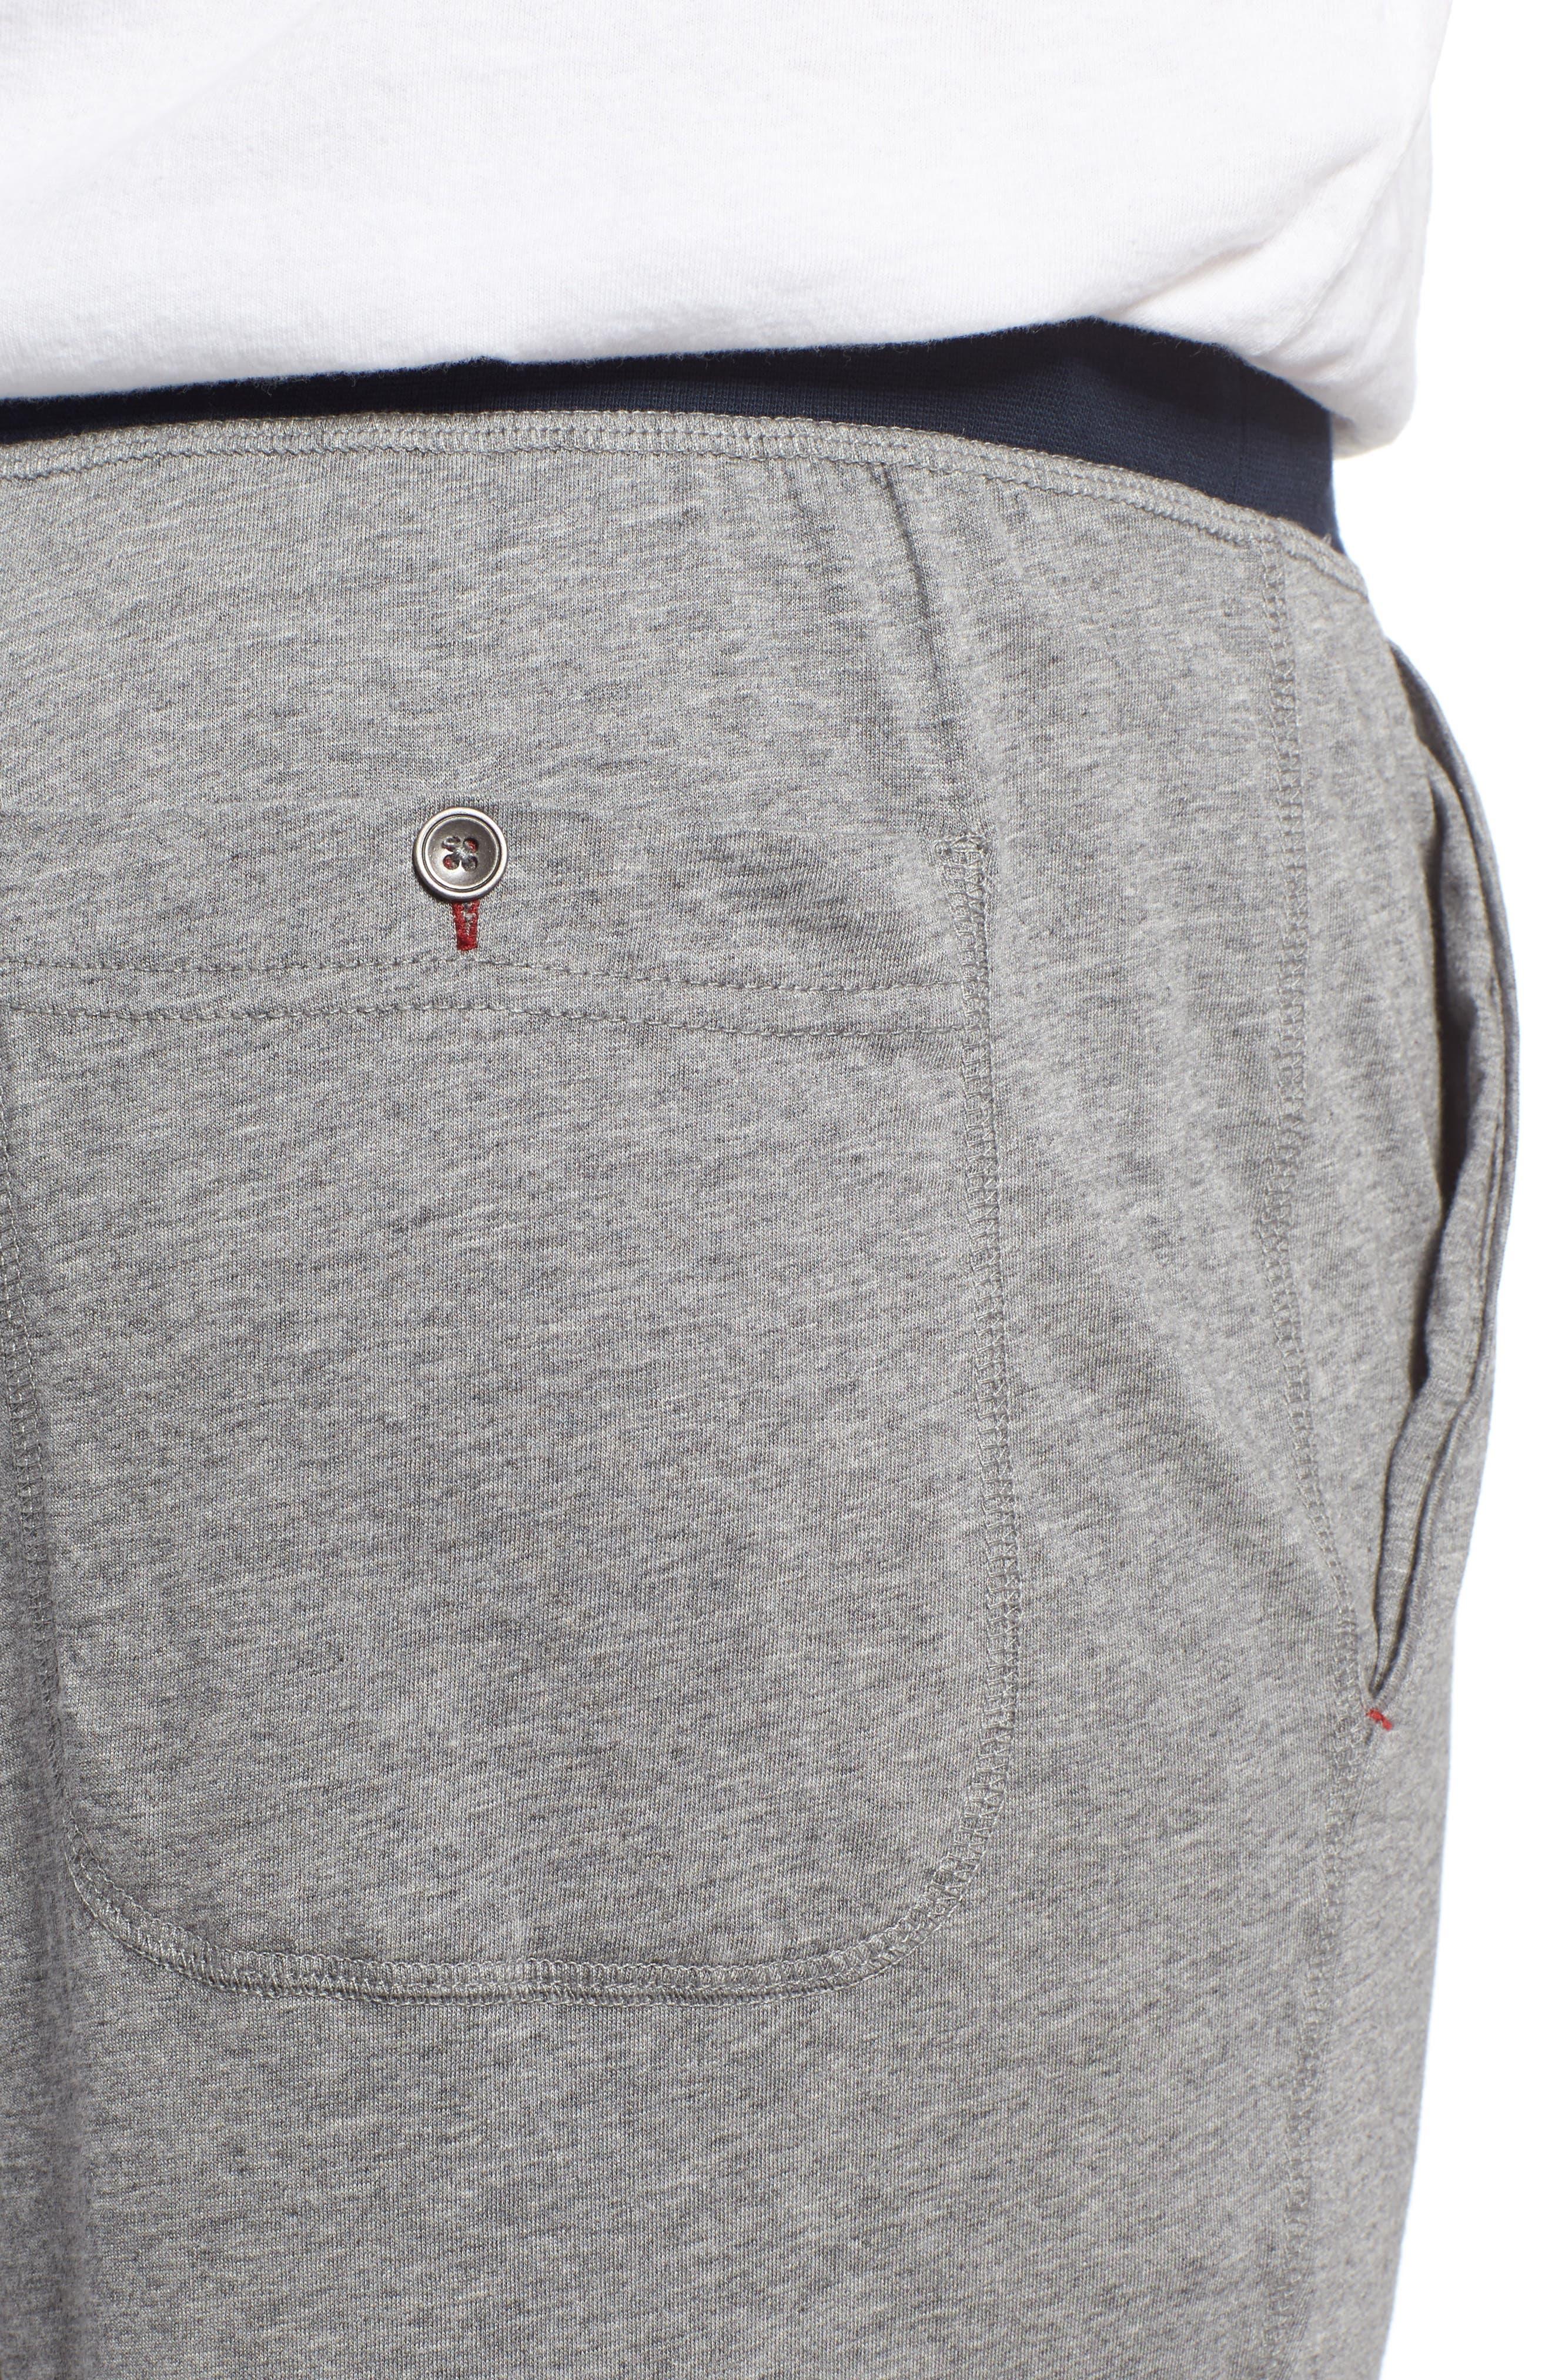 Pima Cotton & Modal Lounge Pants,                             Alternate thumbnail 4, color,                             033